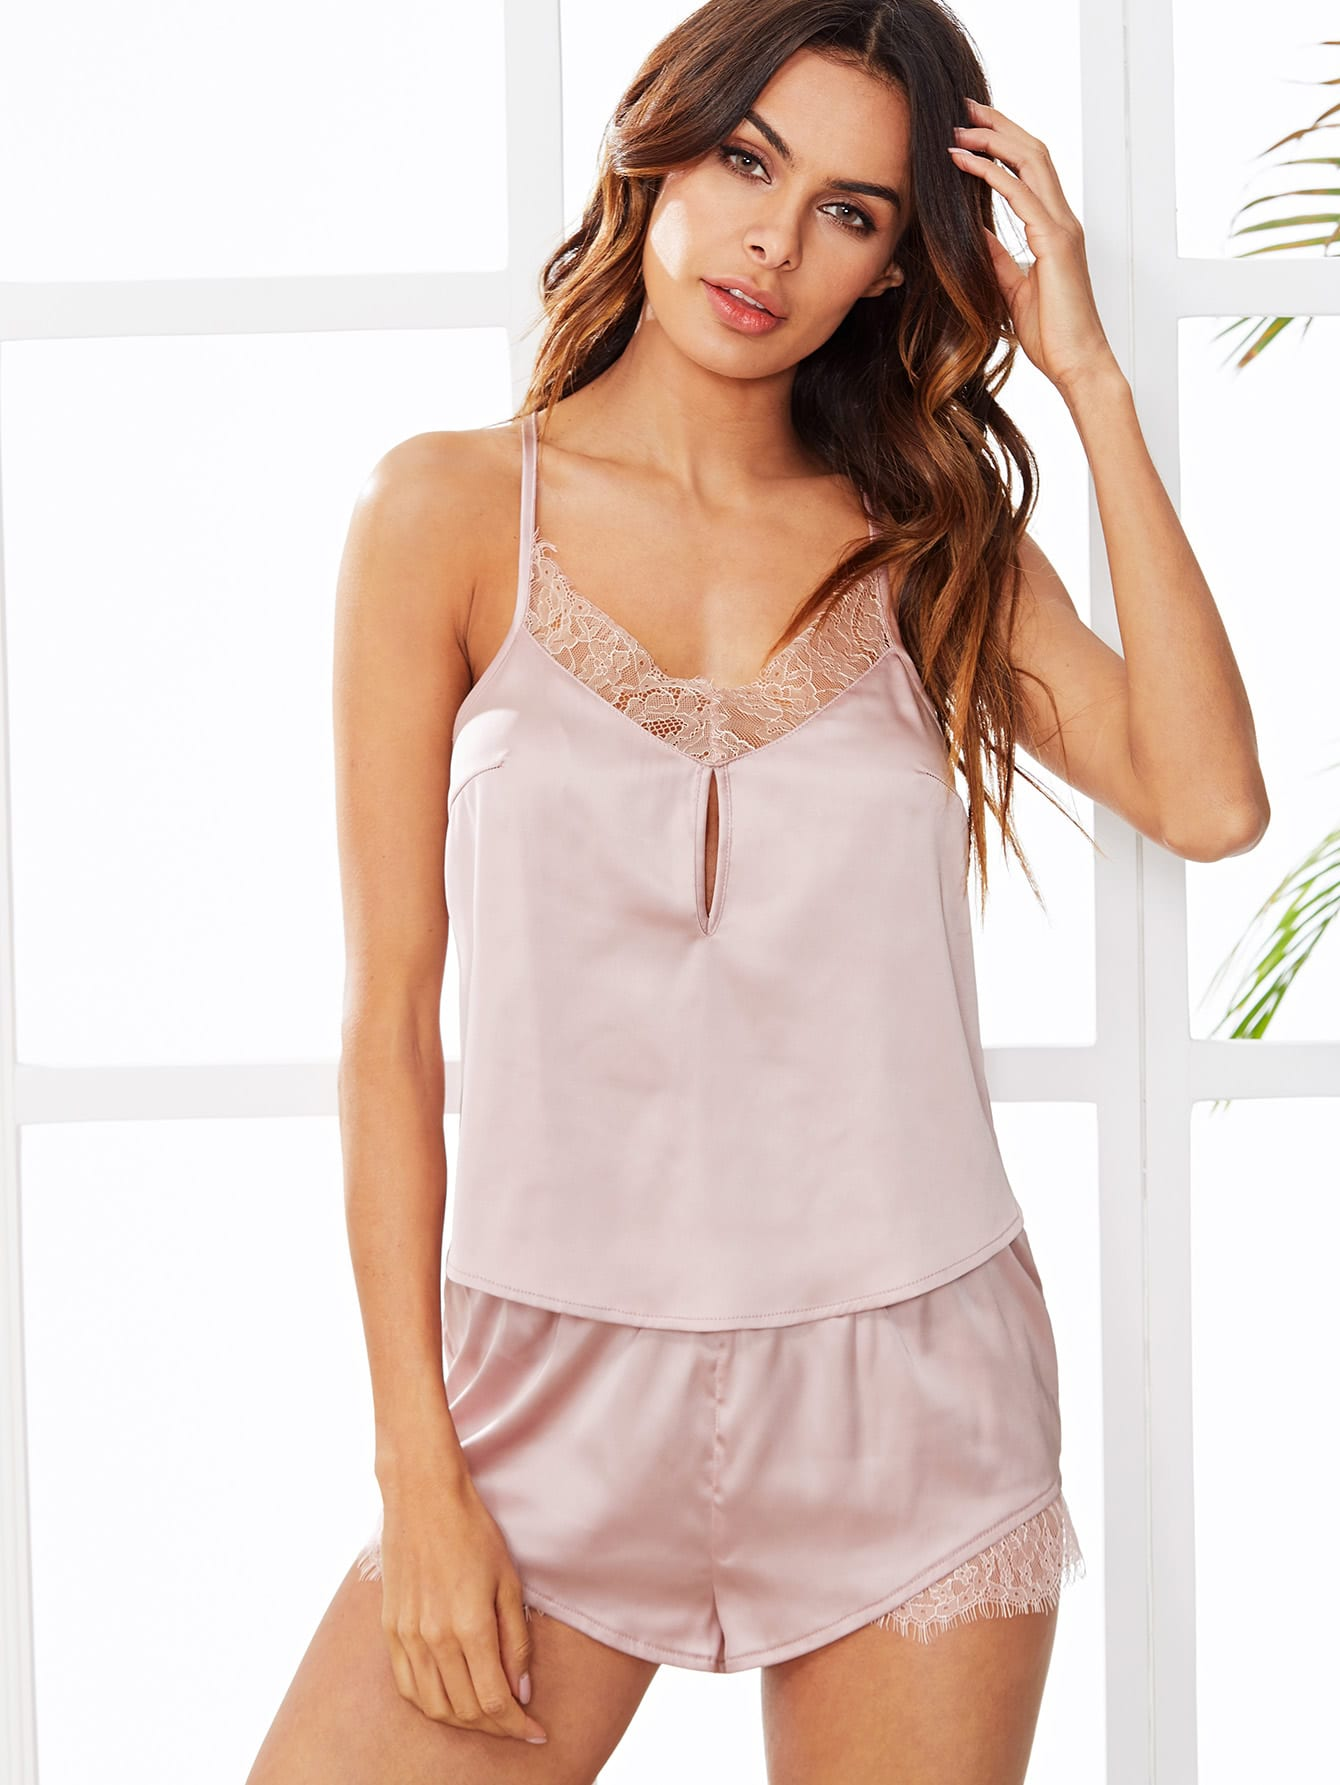 Lace Trim Satin Cami Top & Shorts PJ Set rhinestone happy easter white top shirt hot pink bunny rabbit satin trim baby girl skirt set 1 8y mapsa0494